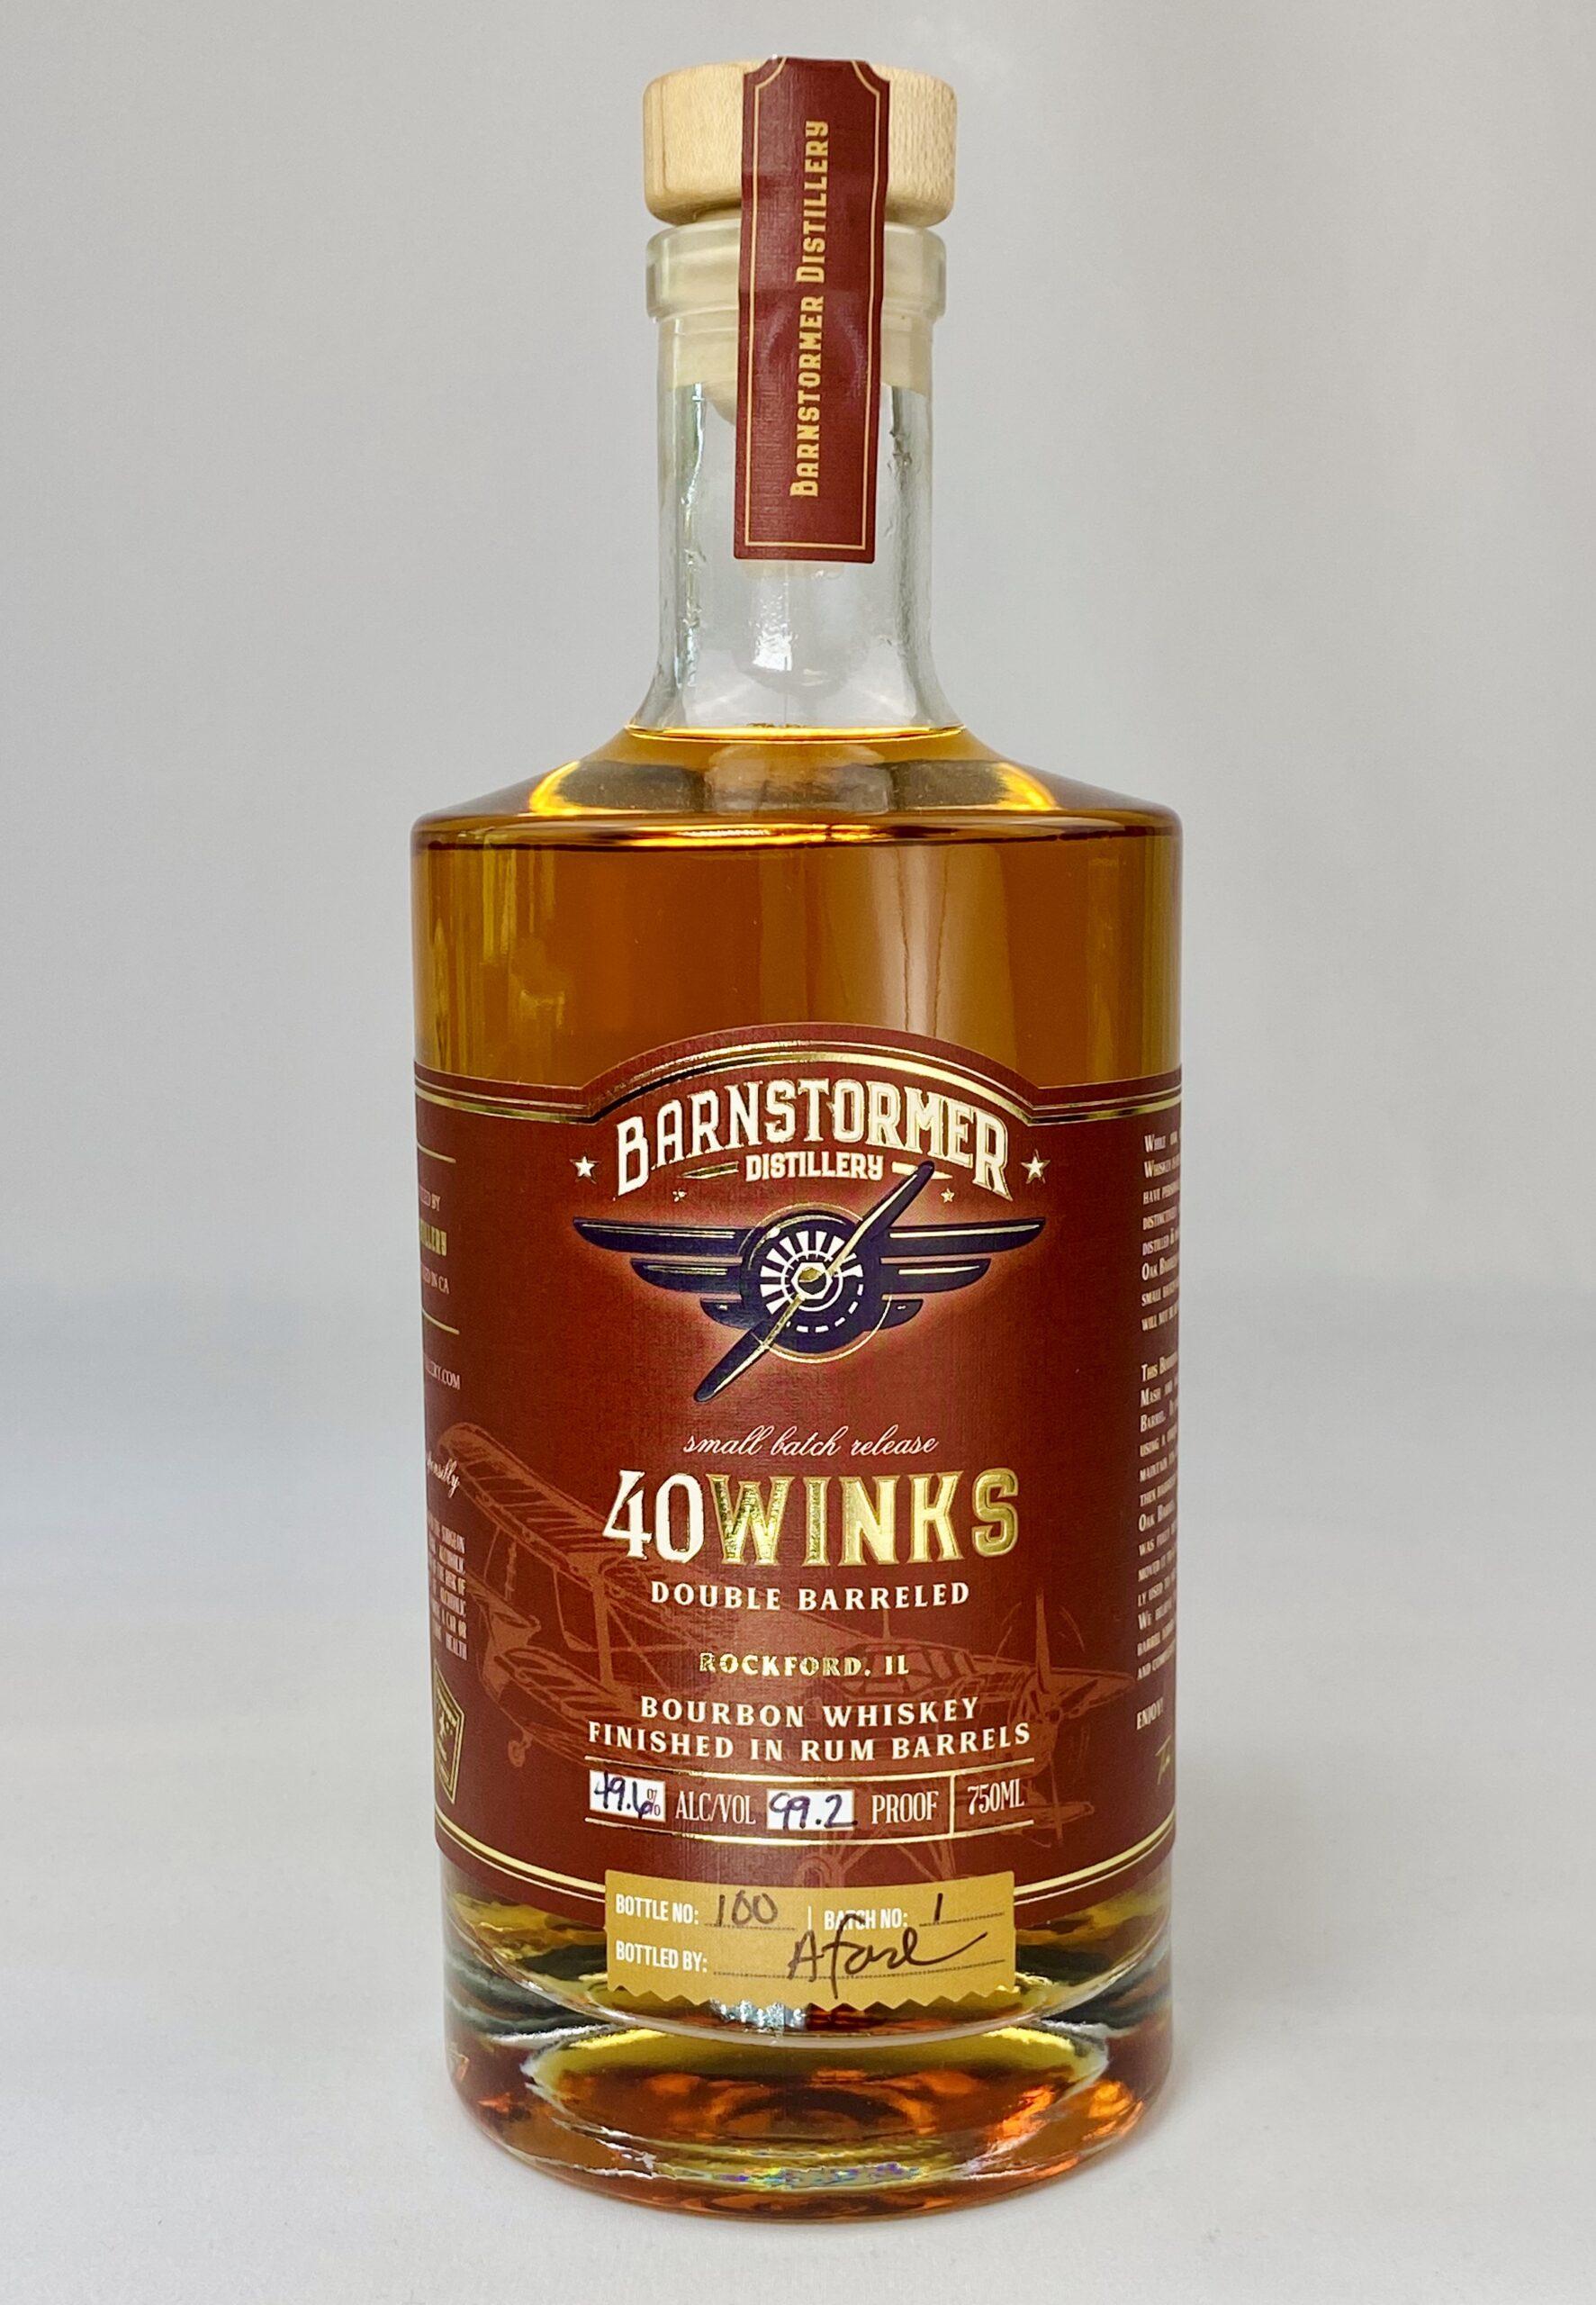 40 Winks Bourbon Finished in Rum Barrels